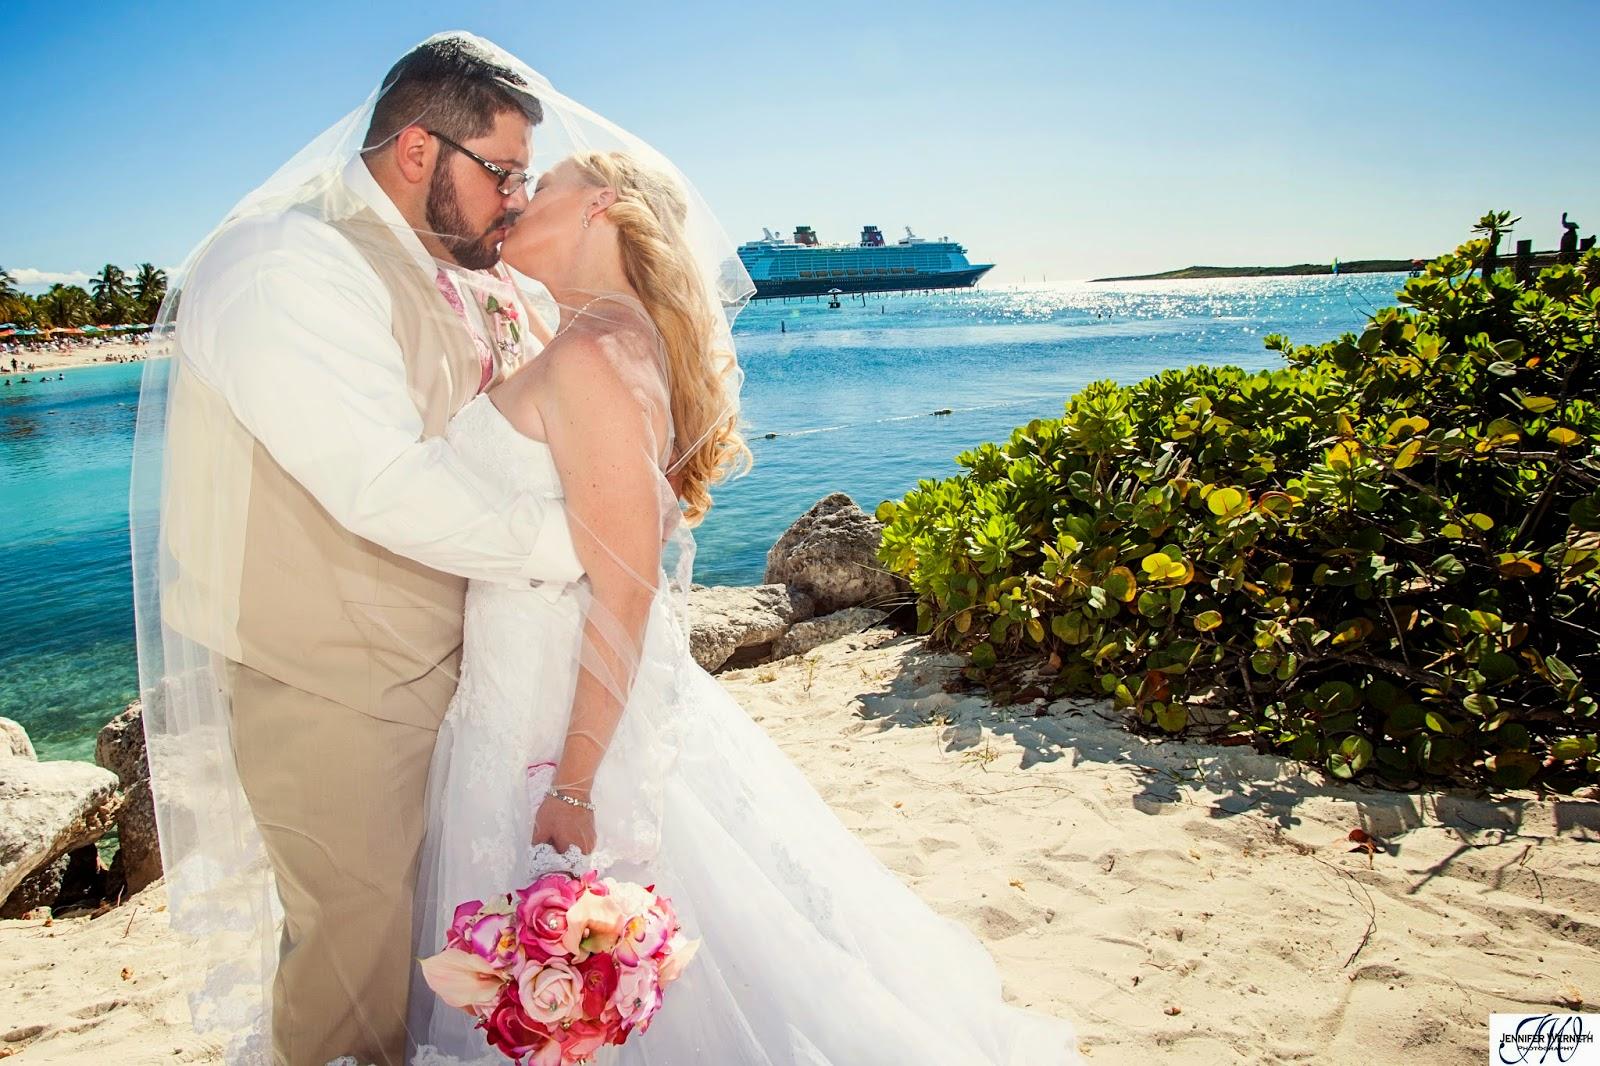 Matthew And Laura Disney Dream Cruise Wedding Photography Castaway Cay Bahamas Nau